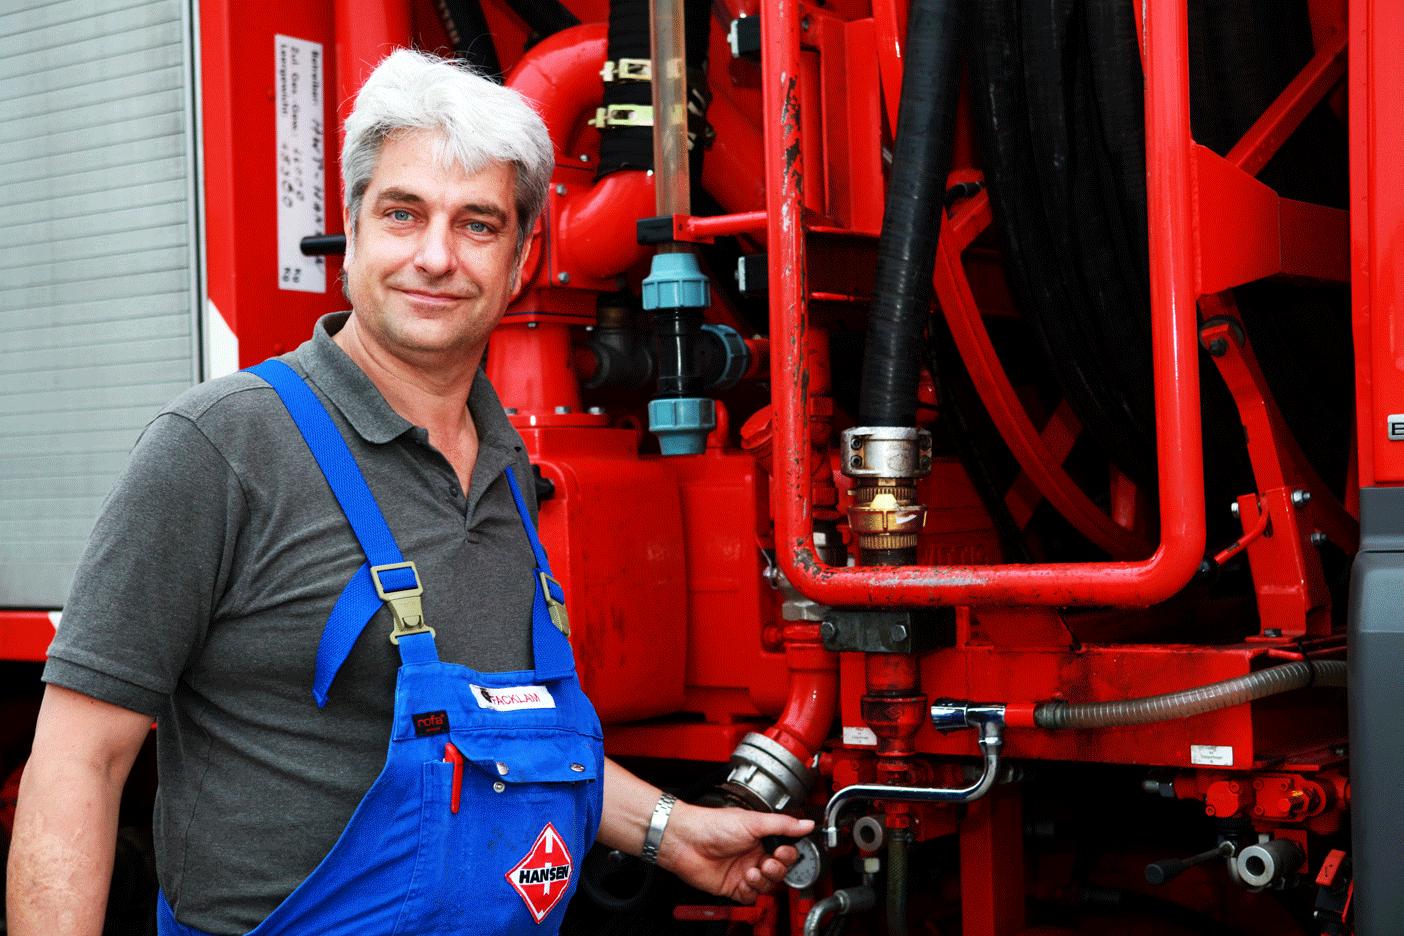 Tankreinigung, Öltanks entsorgen, Tank stilllegen